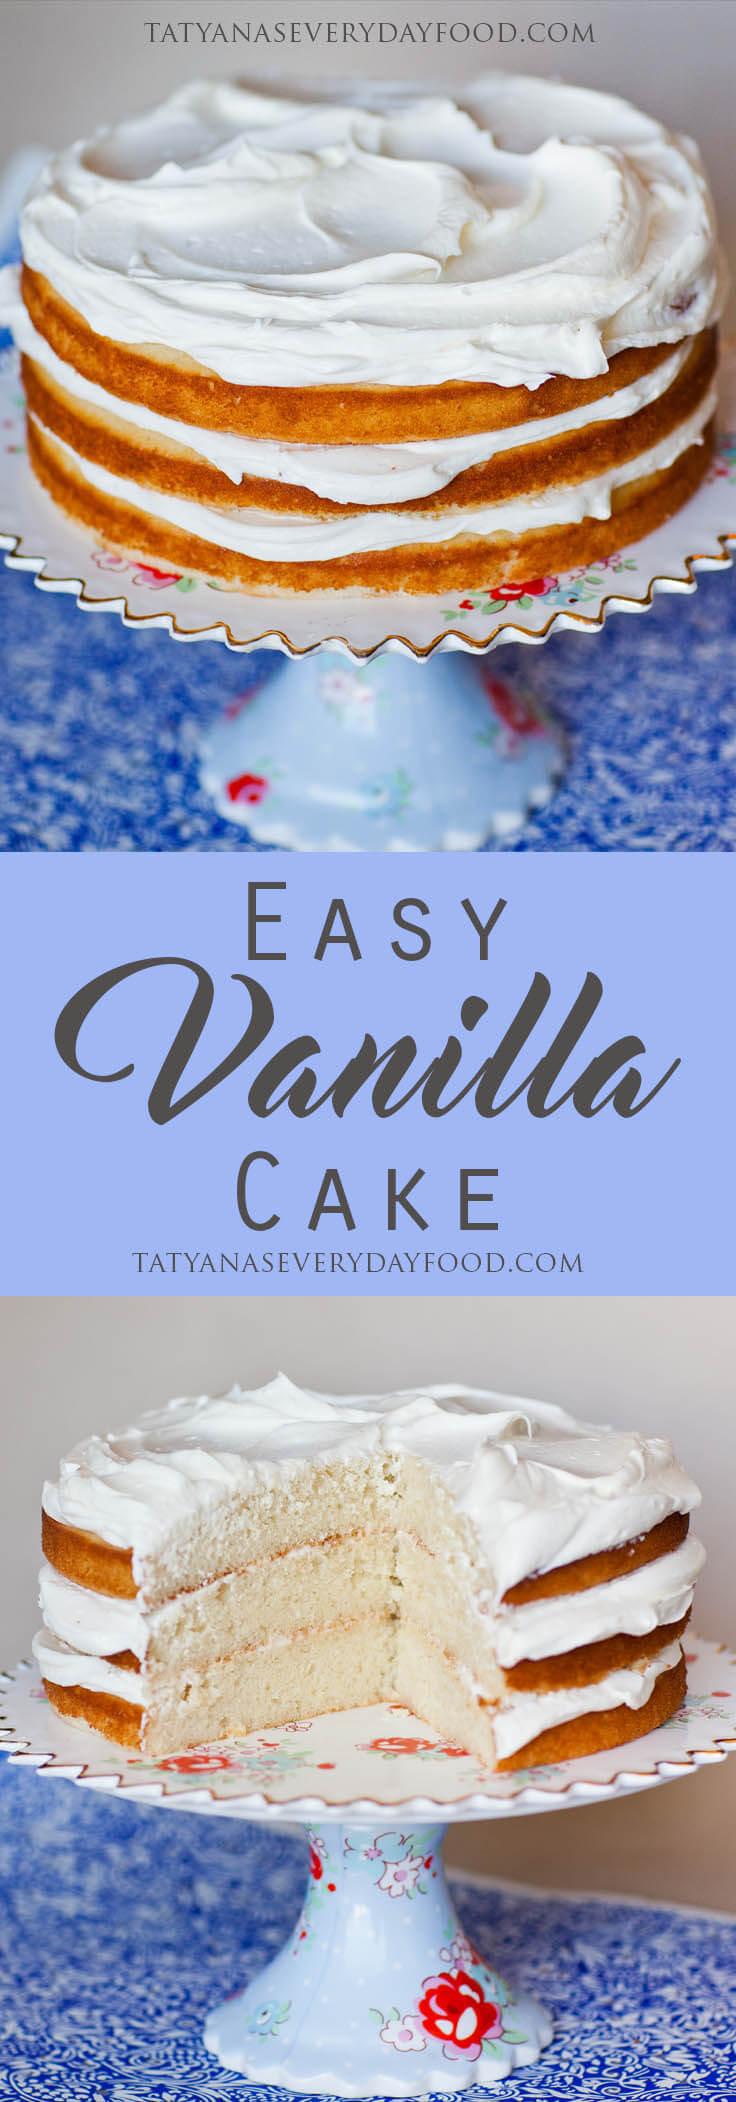 Simple Vanilla Cake Recipe - Tatyanas Everyday Food